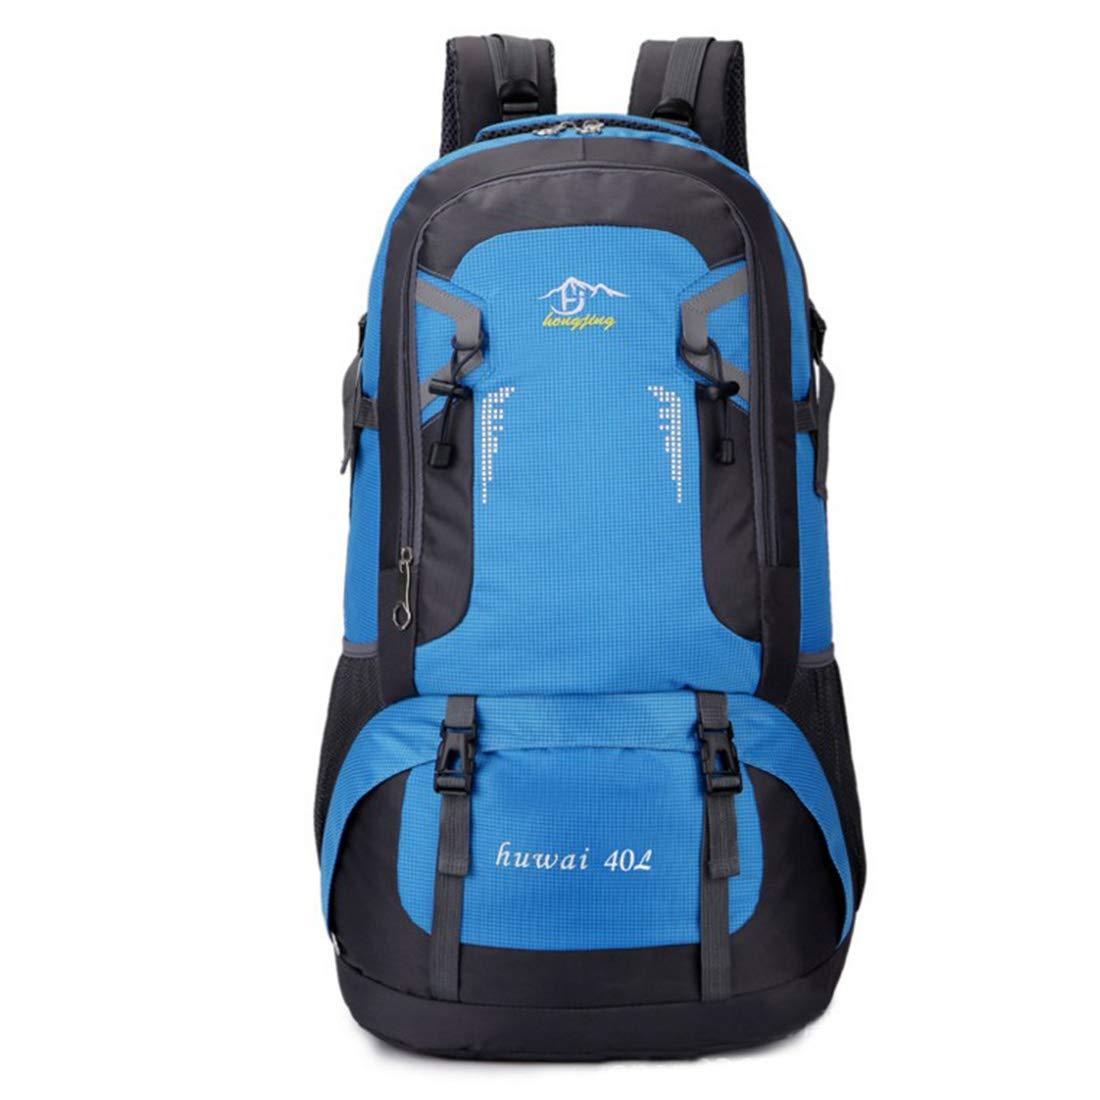 Kunliyin YY1 Wasserdichte Oxford-Bergsteigertasche (Farbe : Blau)